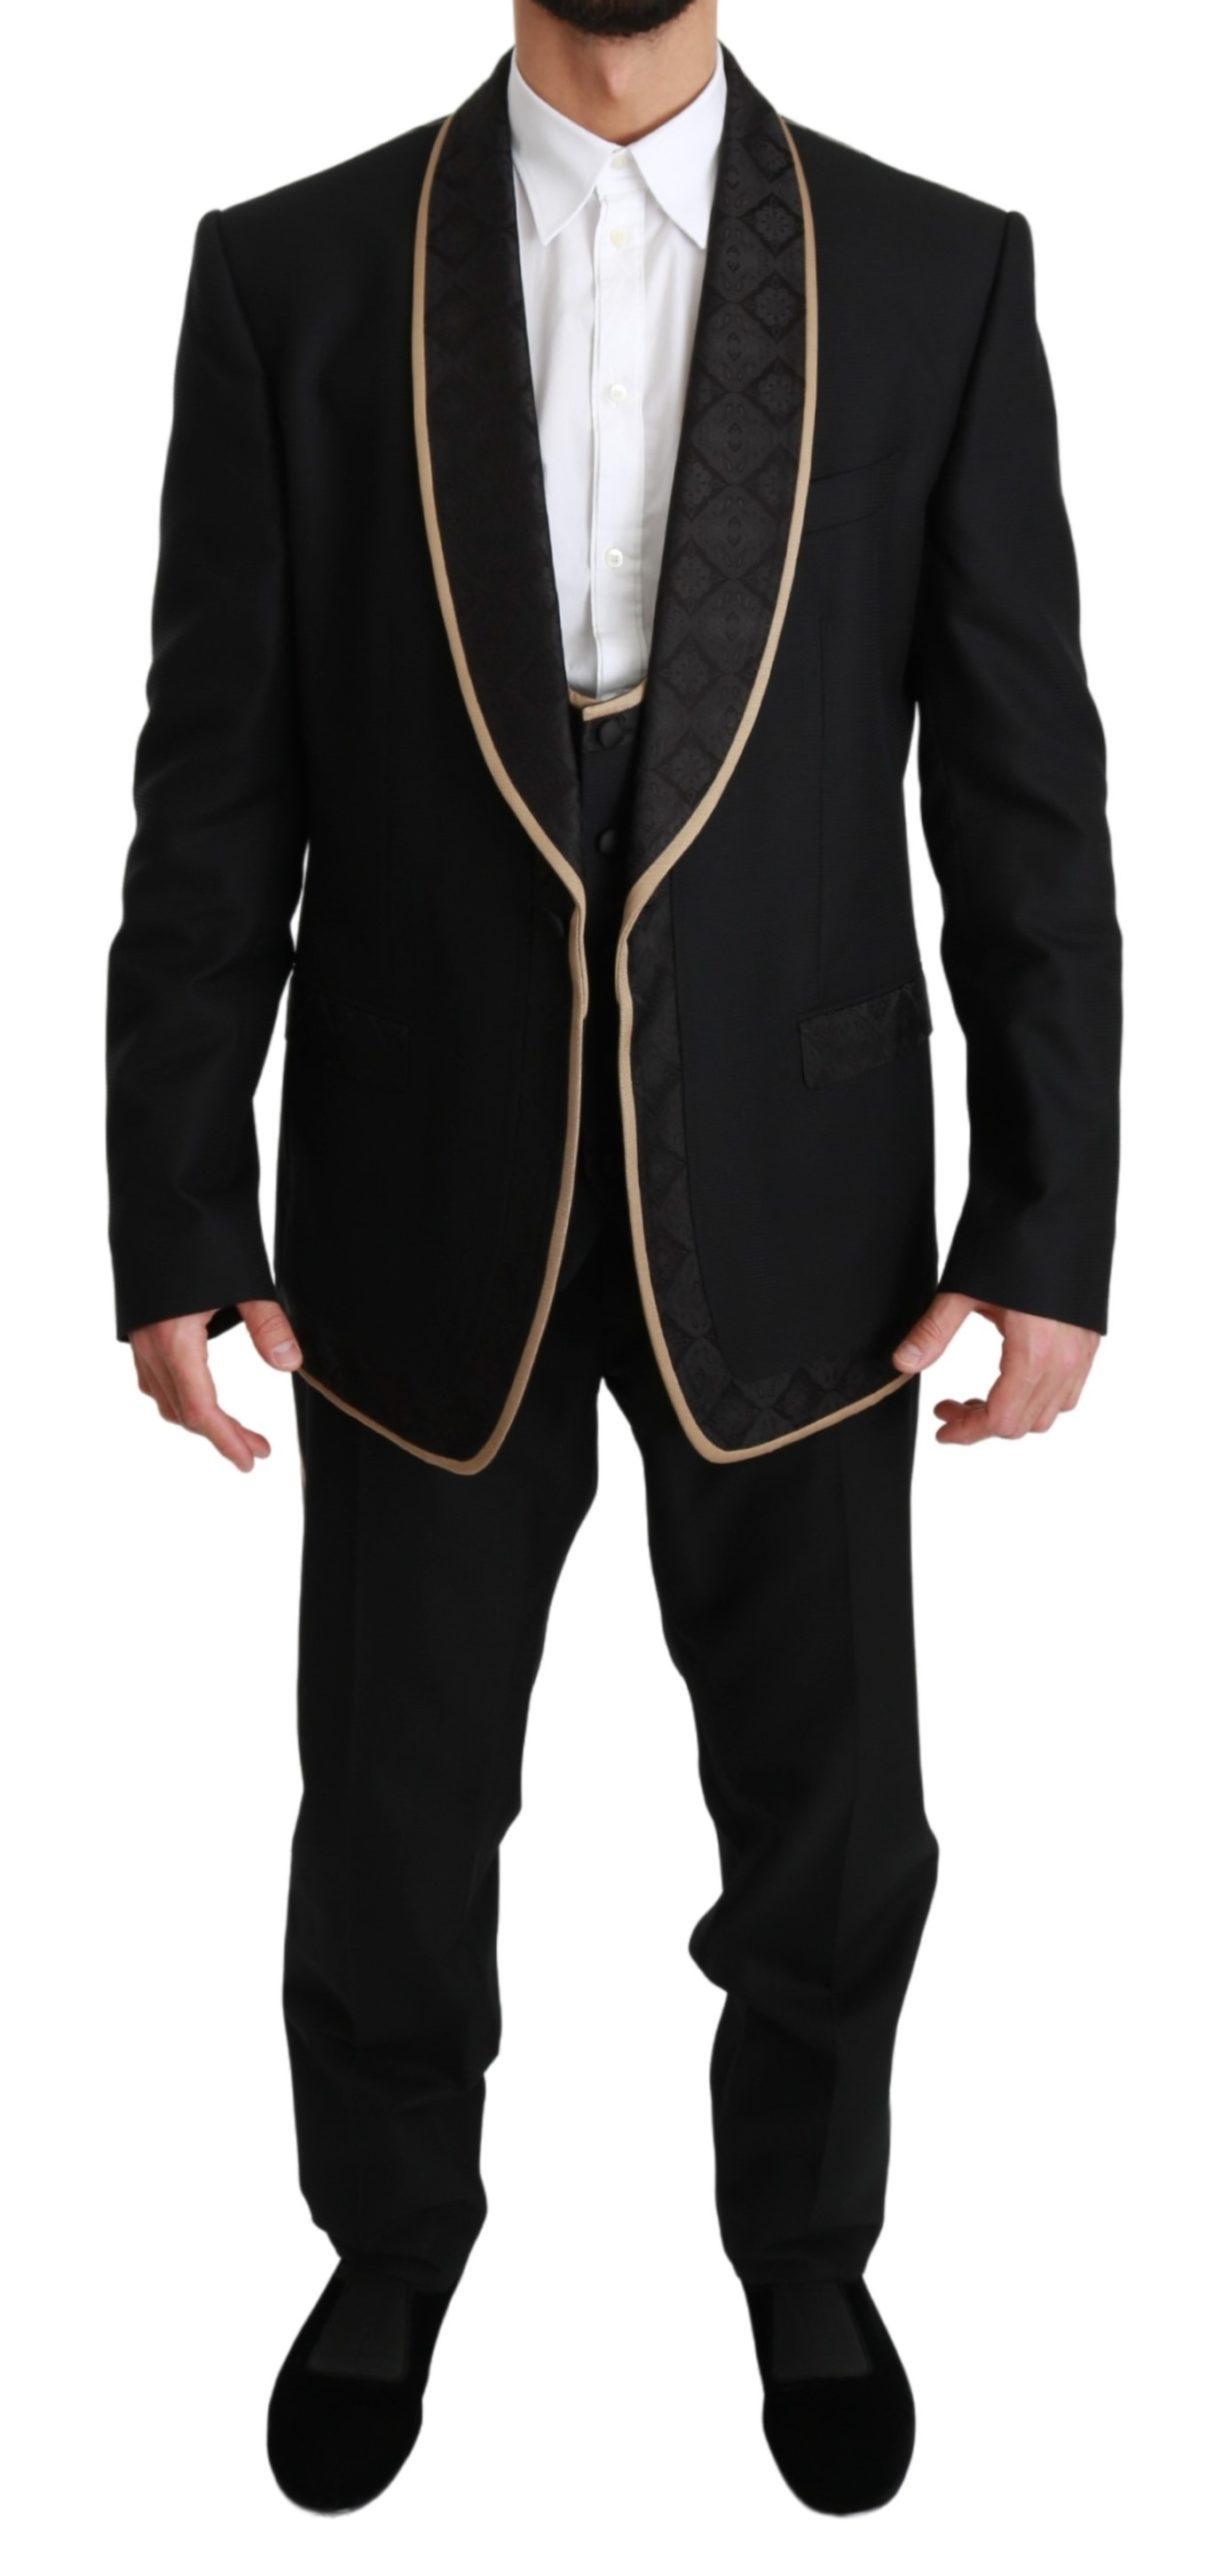 Dolce & Gabbana Men's Single Breasted 3 Piece SICILIA Suit Beige KOS1662 - IT56 | XXL